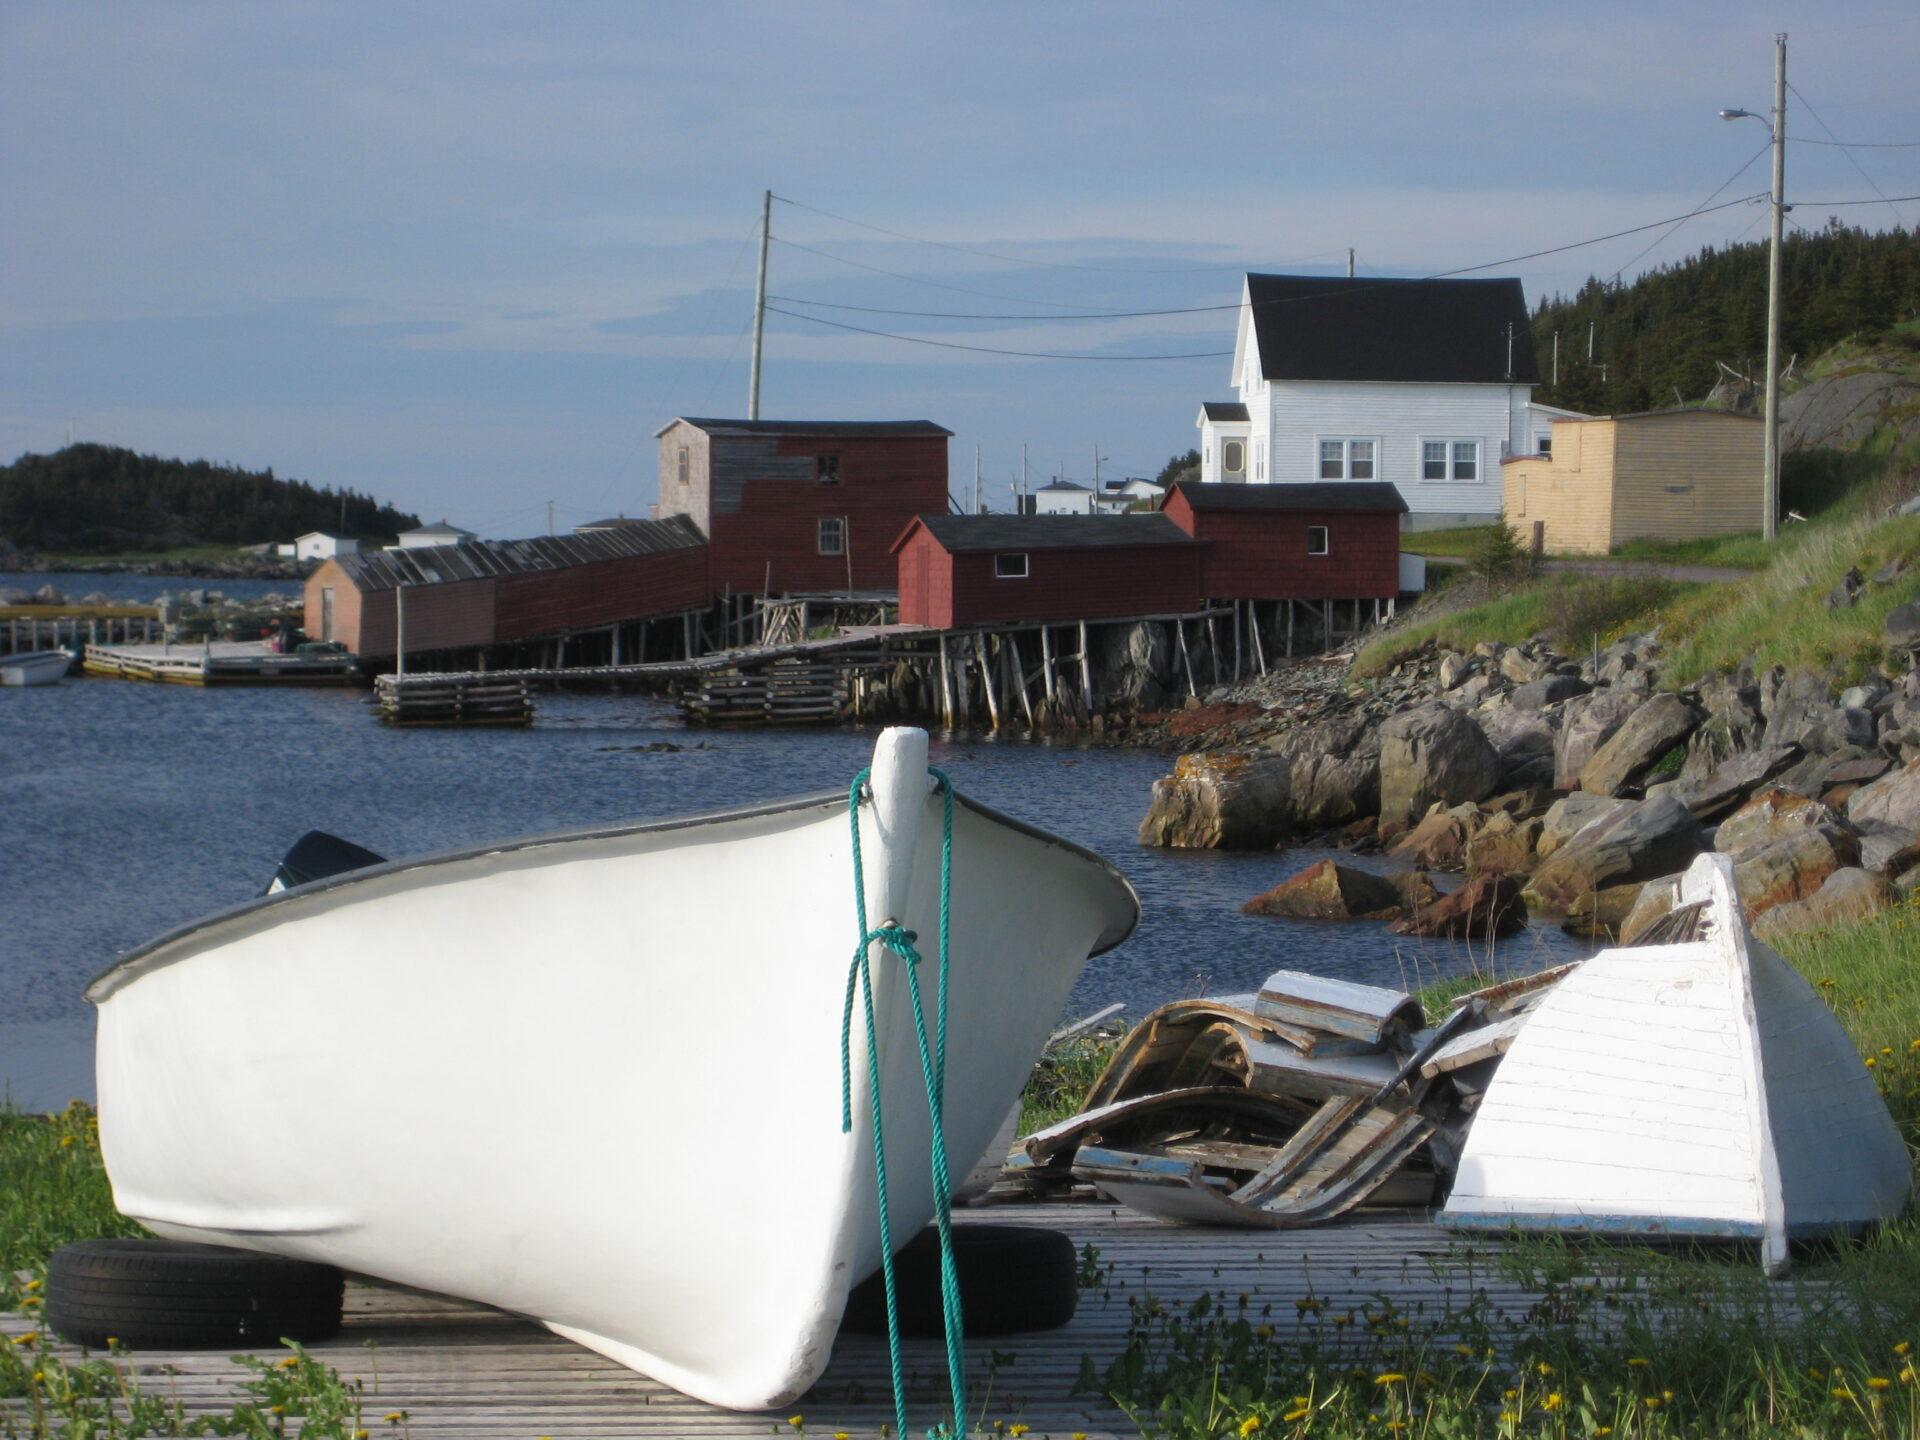 Green Roof Newfoundland 1